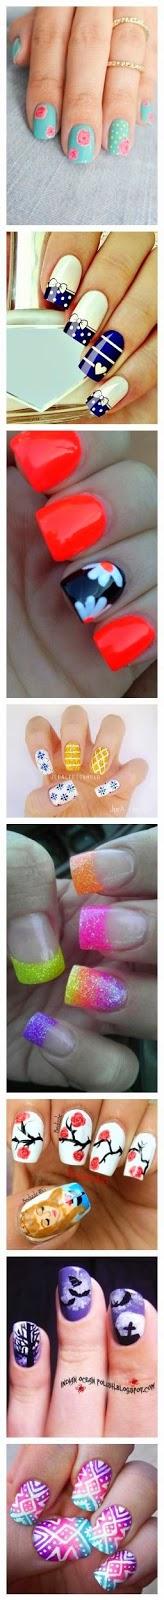 Nail Art Ideas Tutorials...